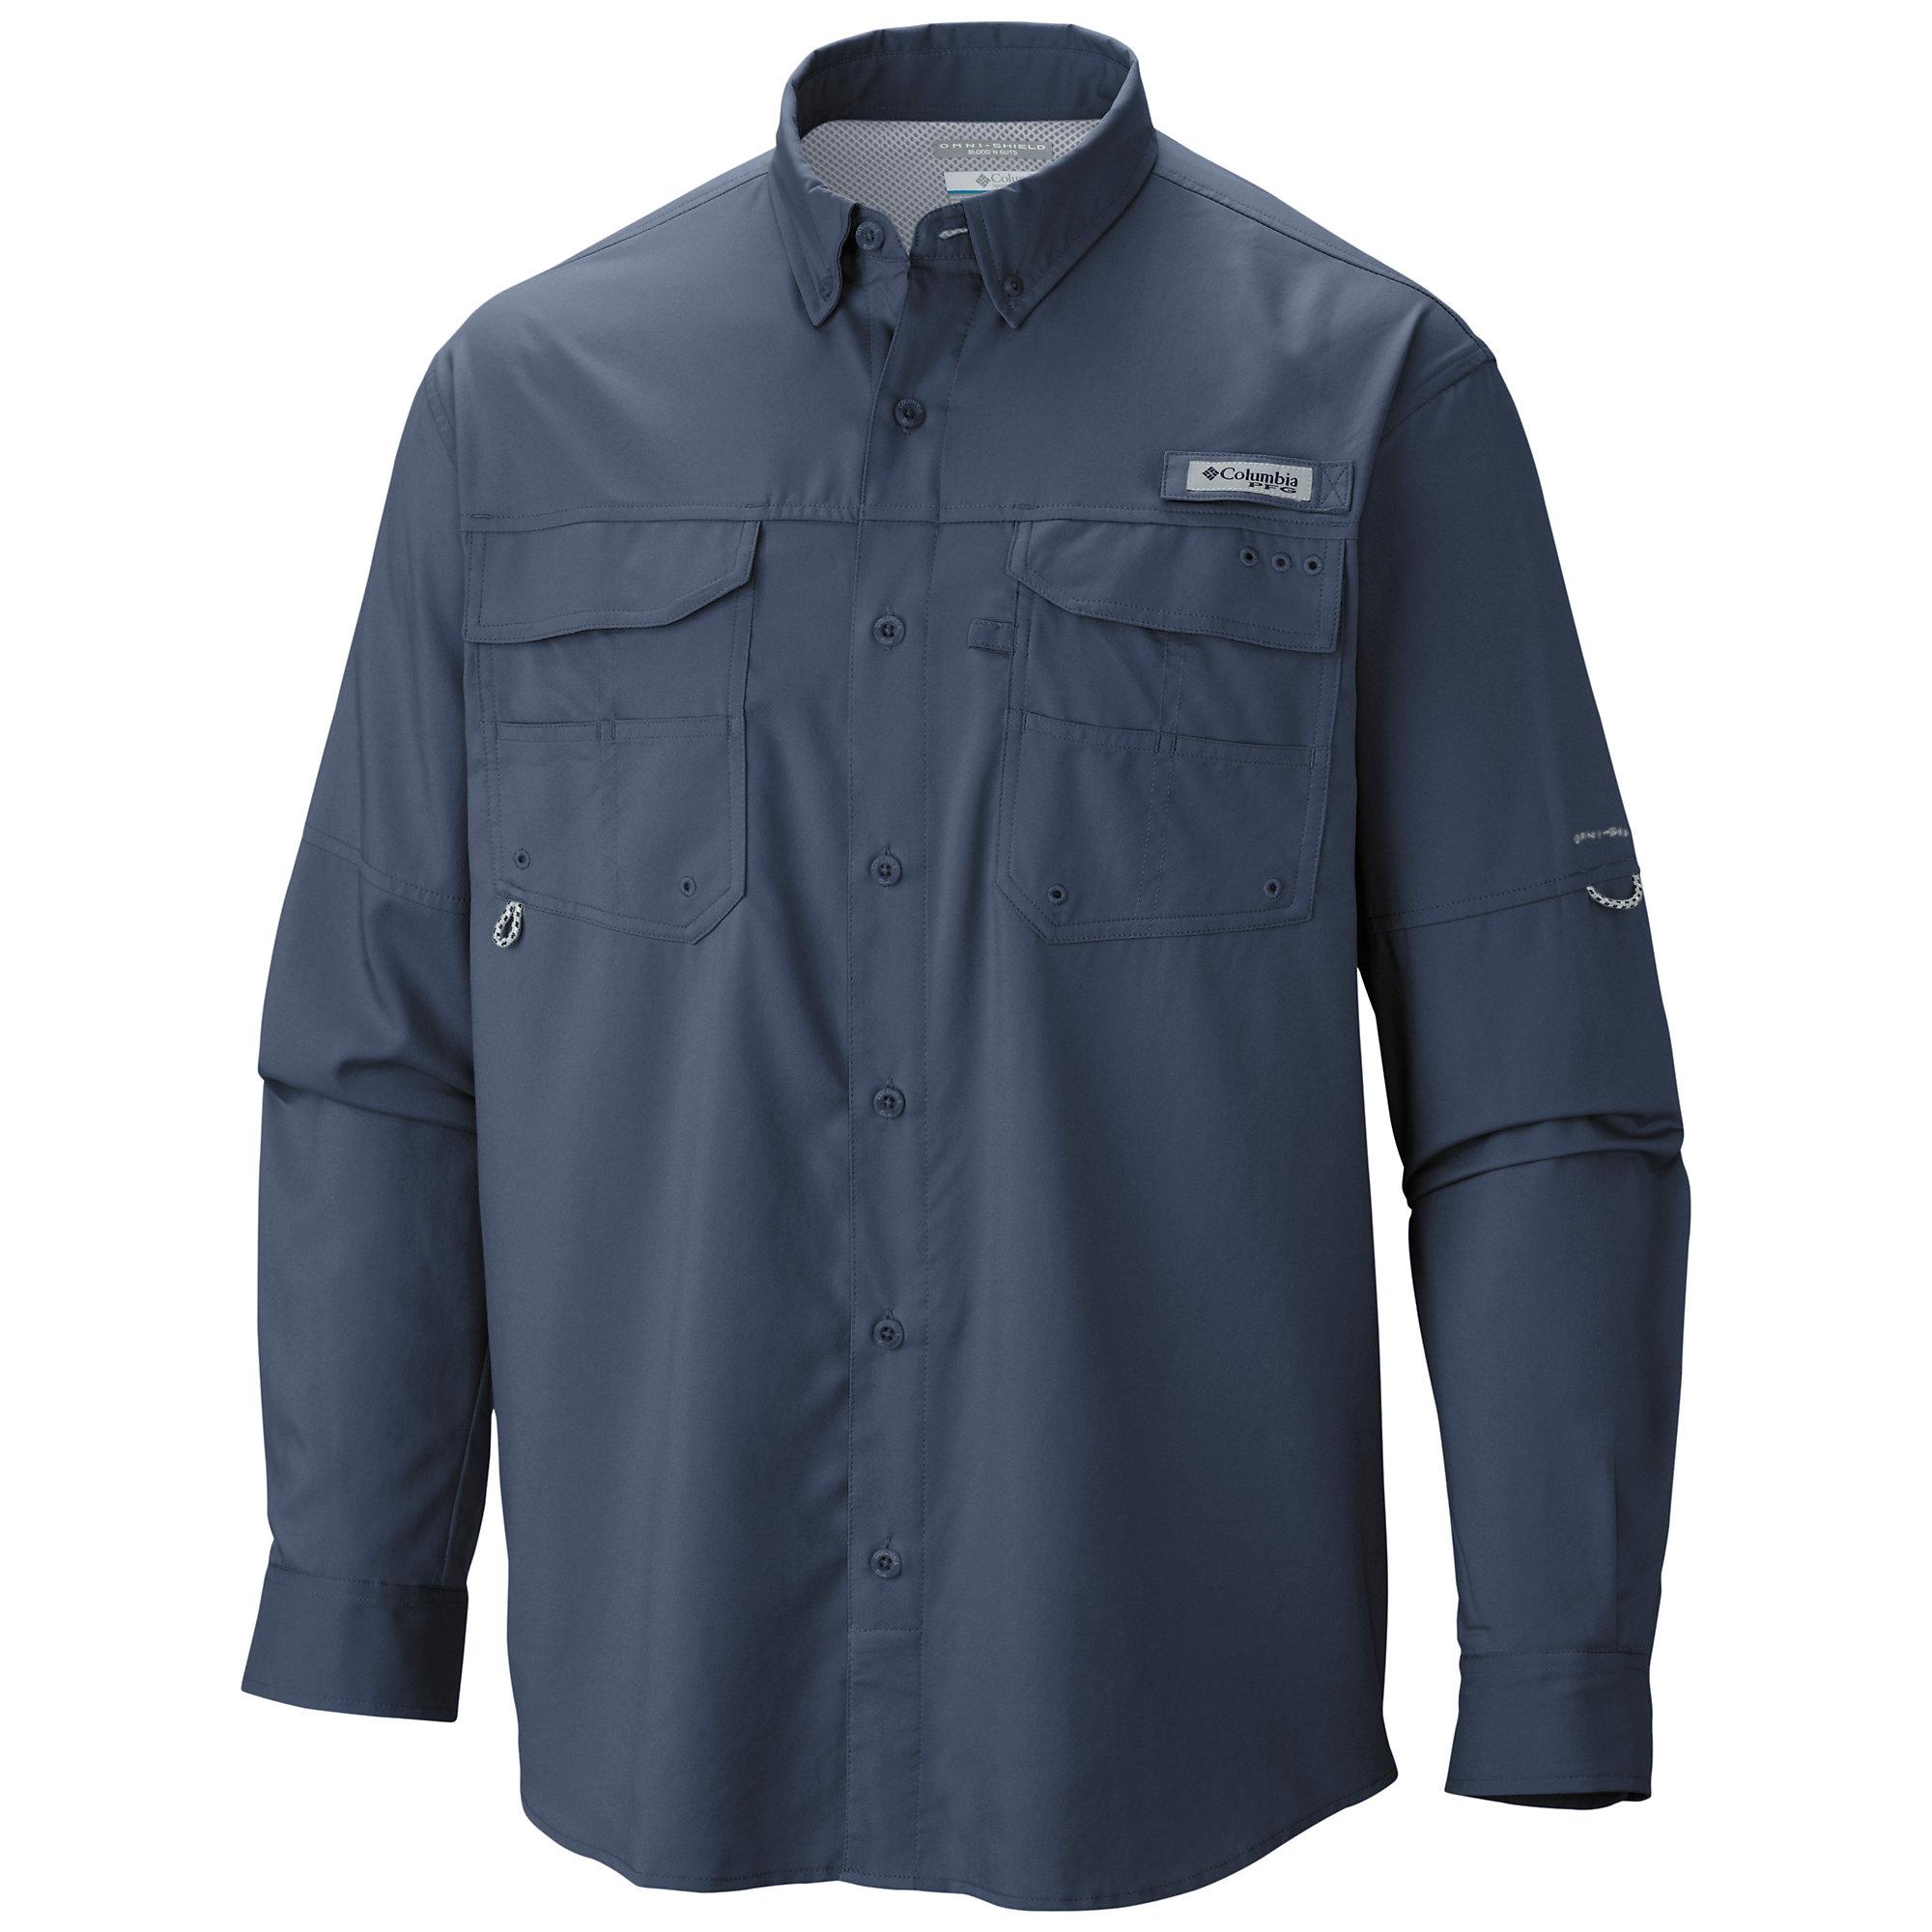 Columbia PFG Blood and Guts III Long Sleeve Woven Shirt